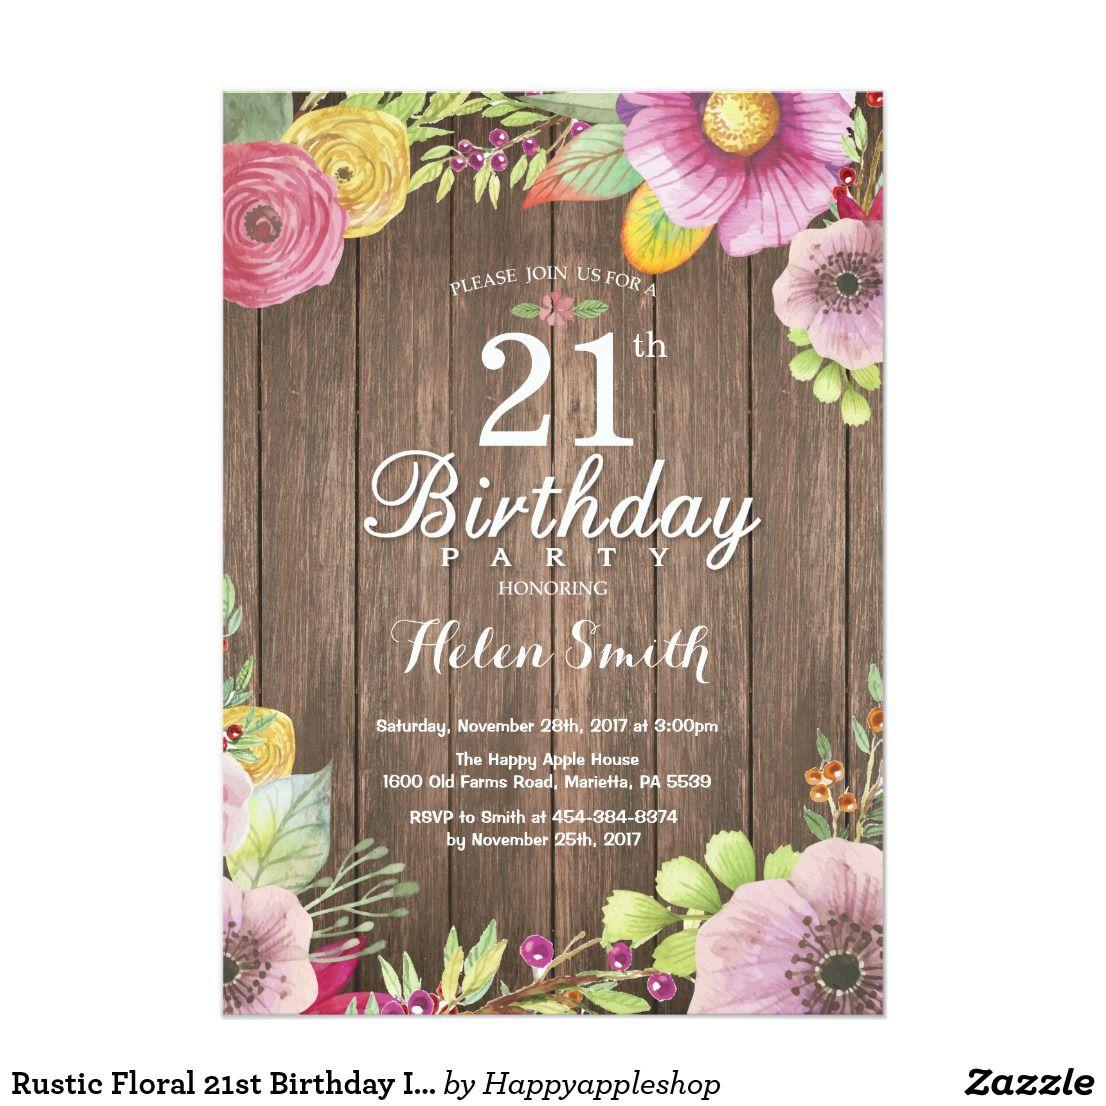 Rustic Floral 21st Birthday Invitation for Women | Pinterest | Birthdays